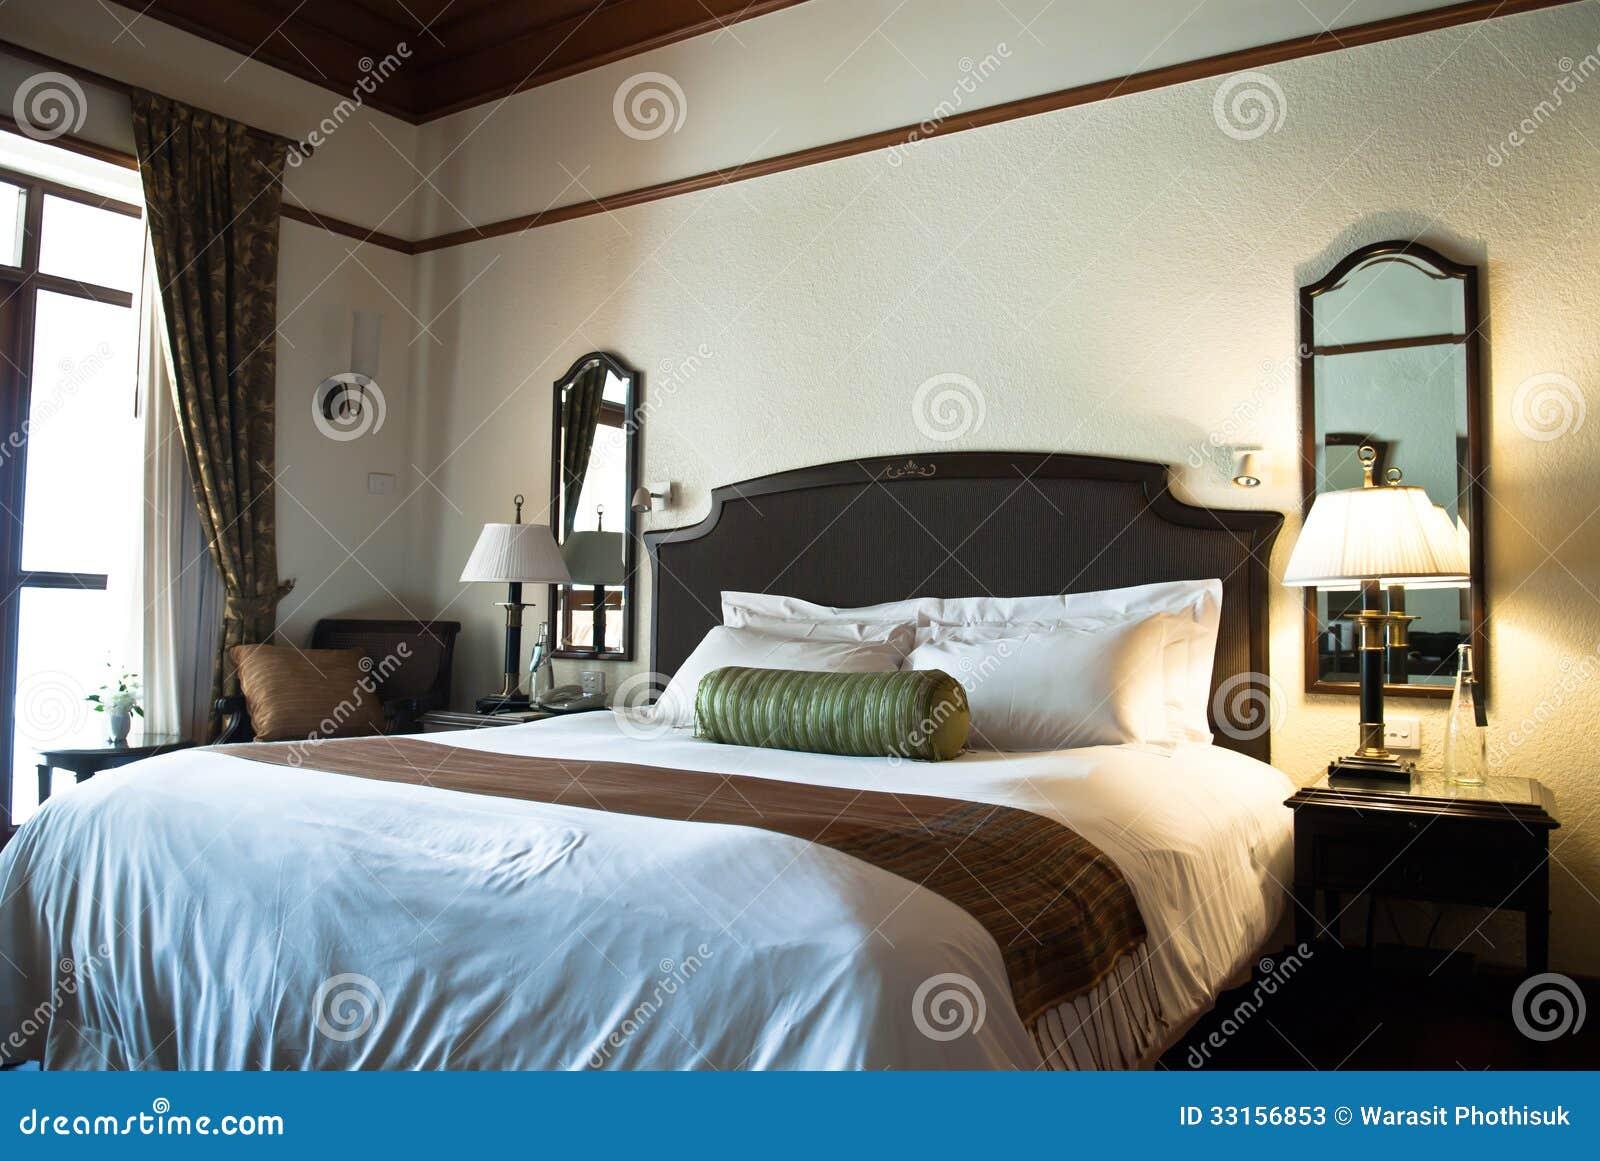 Hotel bedroom stock image. Image of comfortable, bedding ...